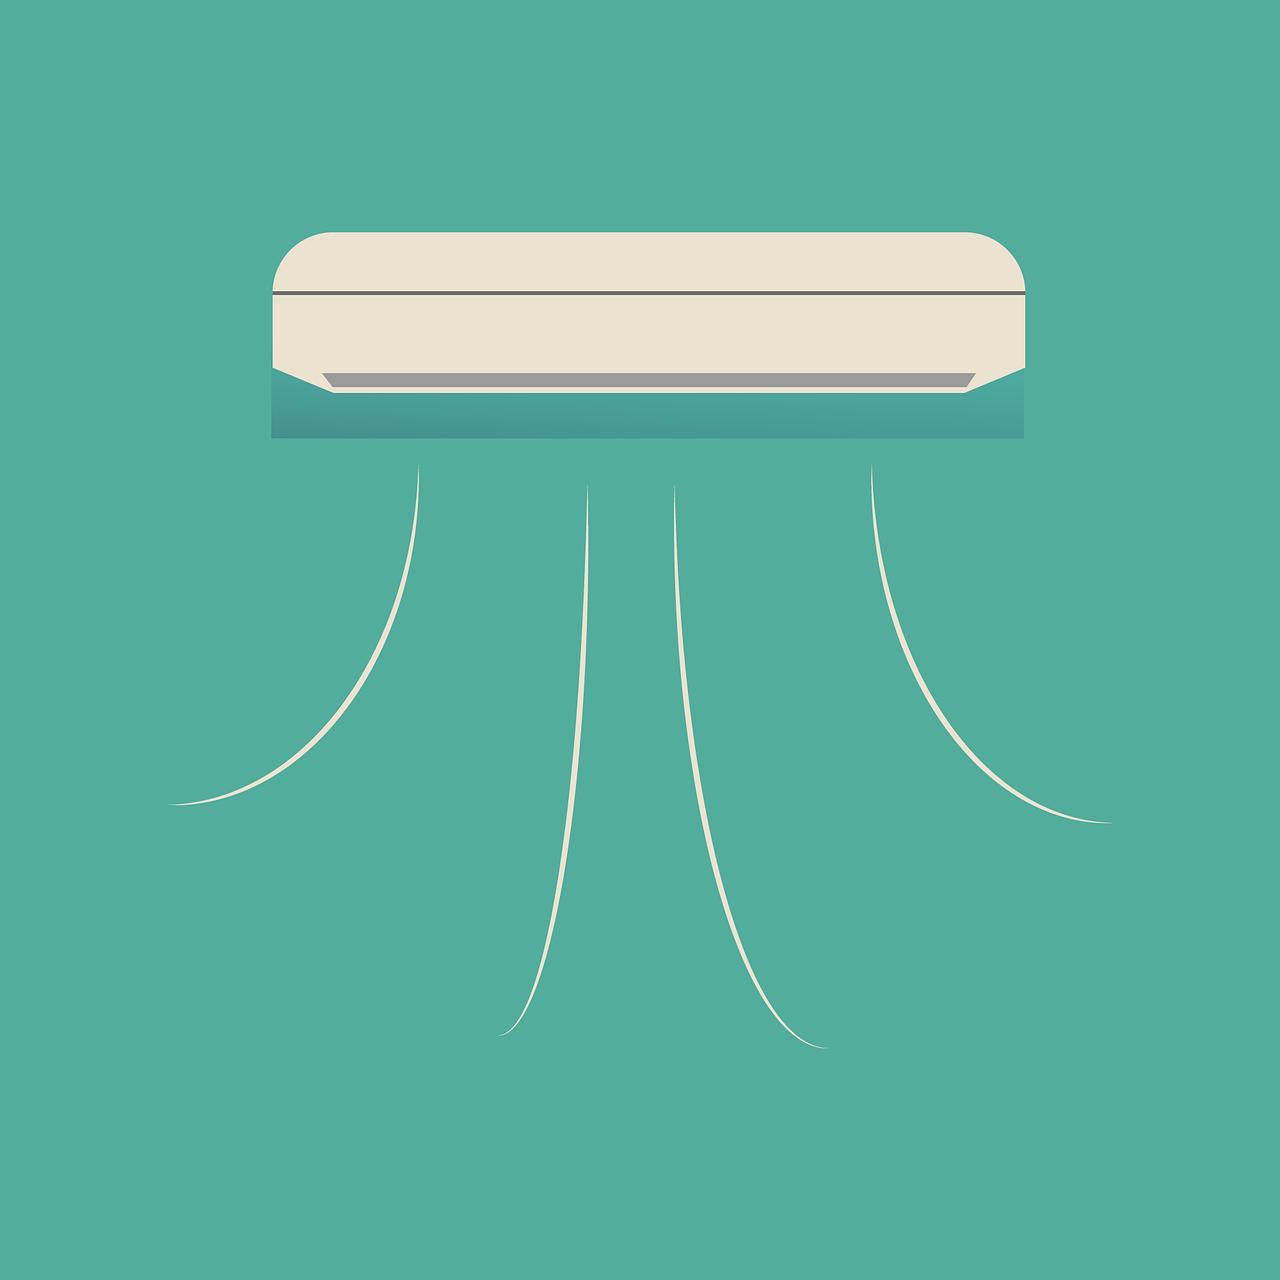 installer une climatisation r versible atouts et conseils. Black Bedroom Furniture Sets. Home Design Ideas